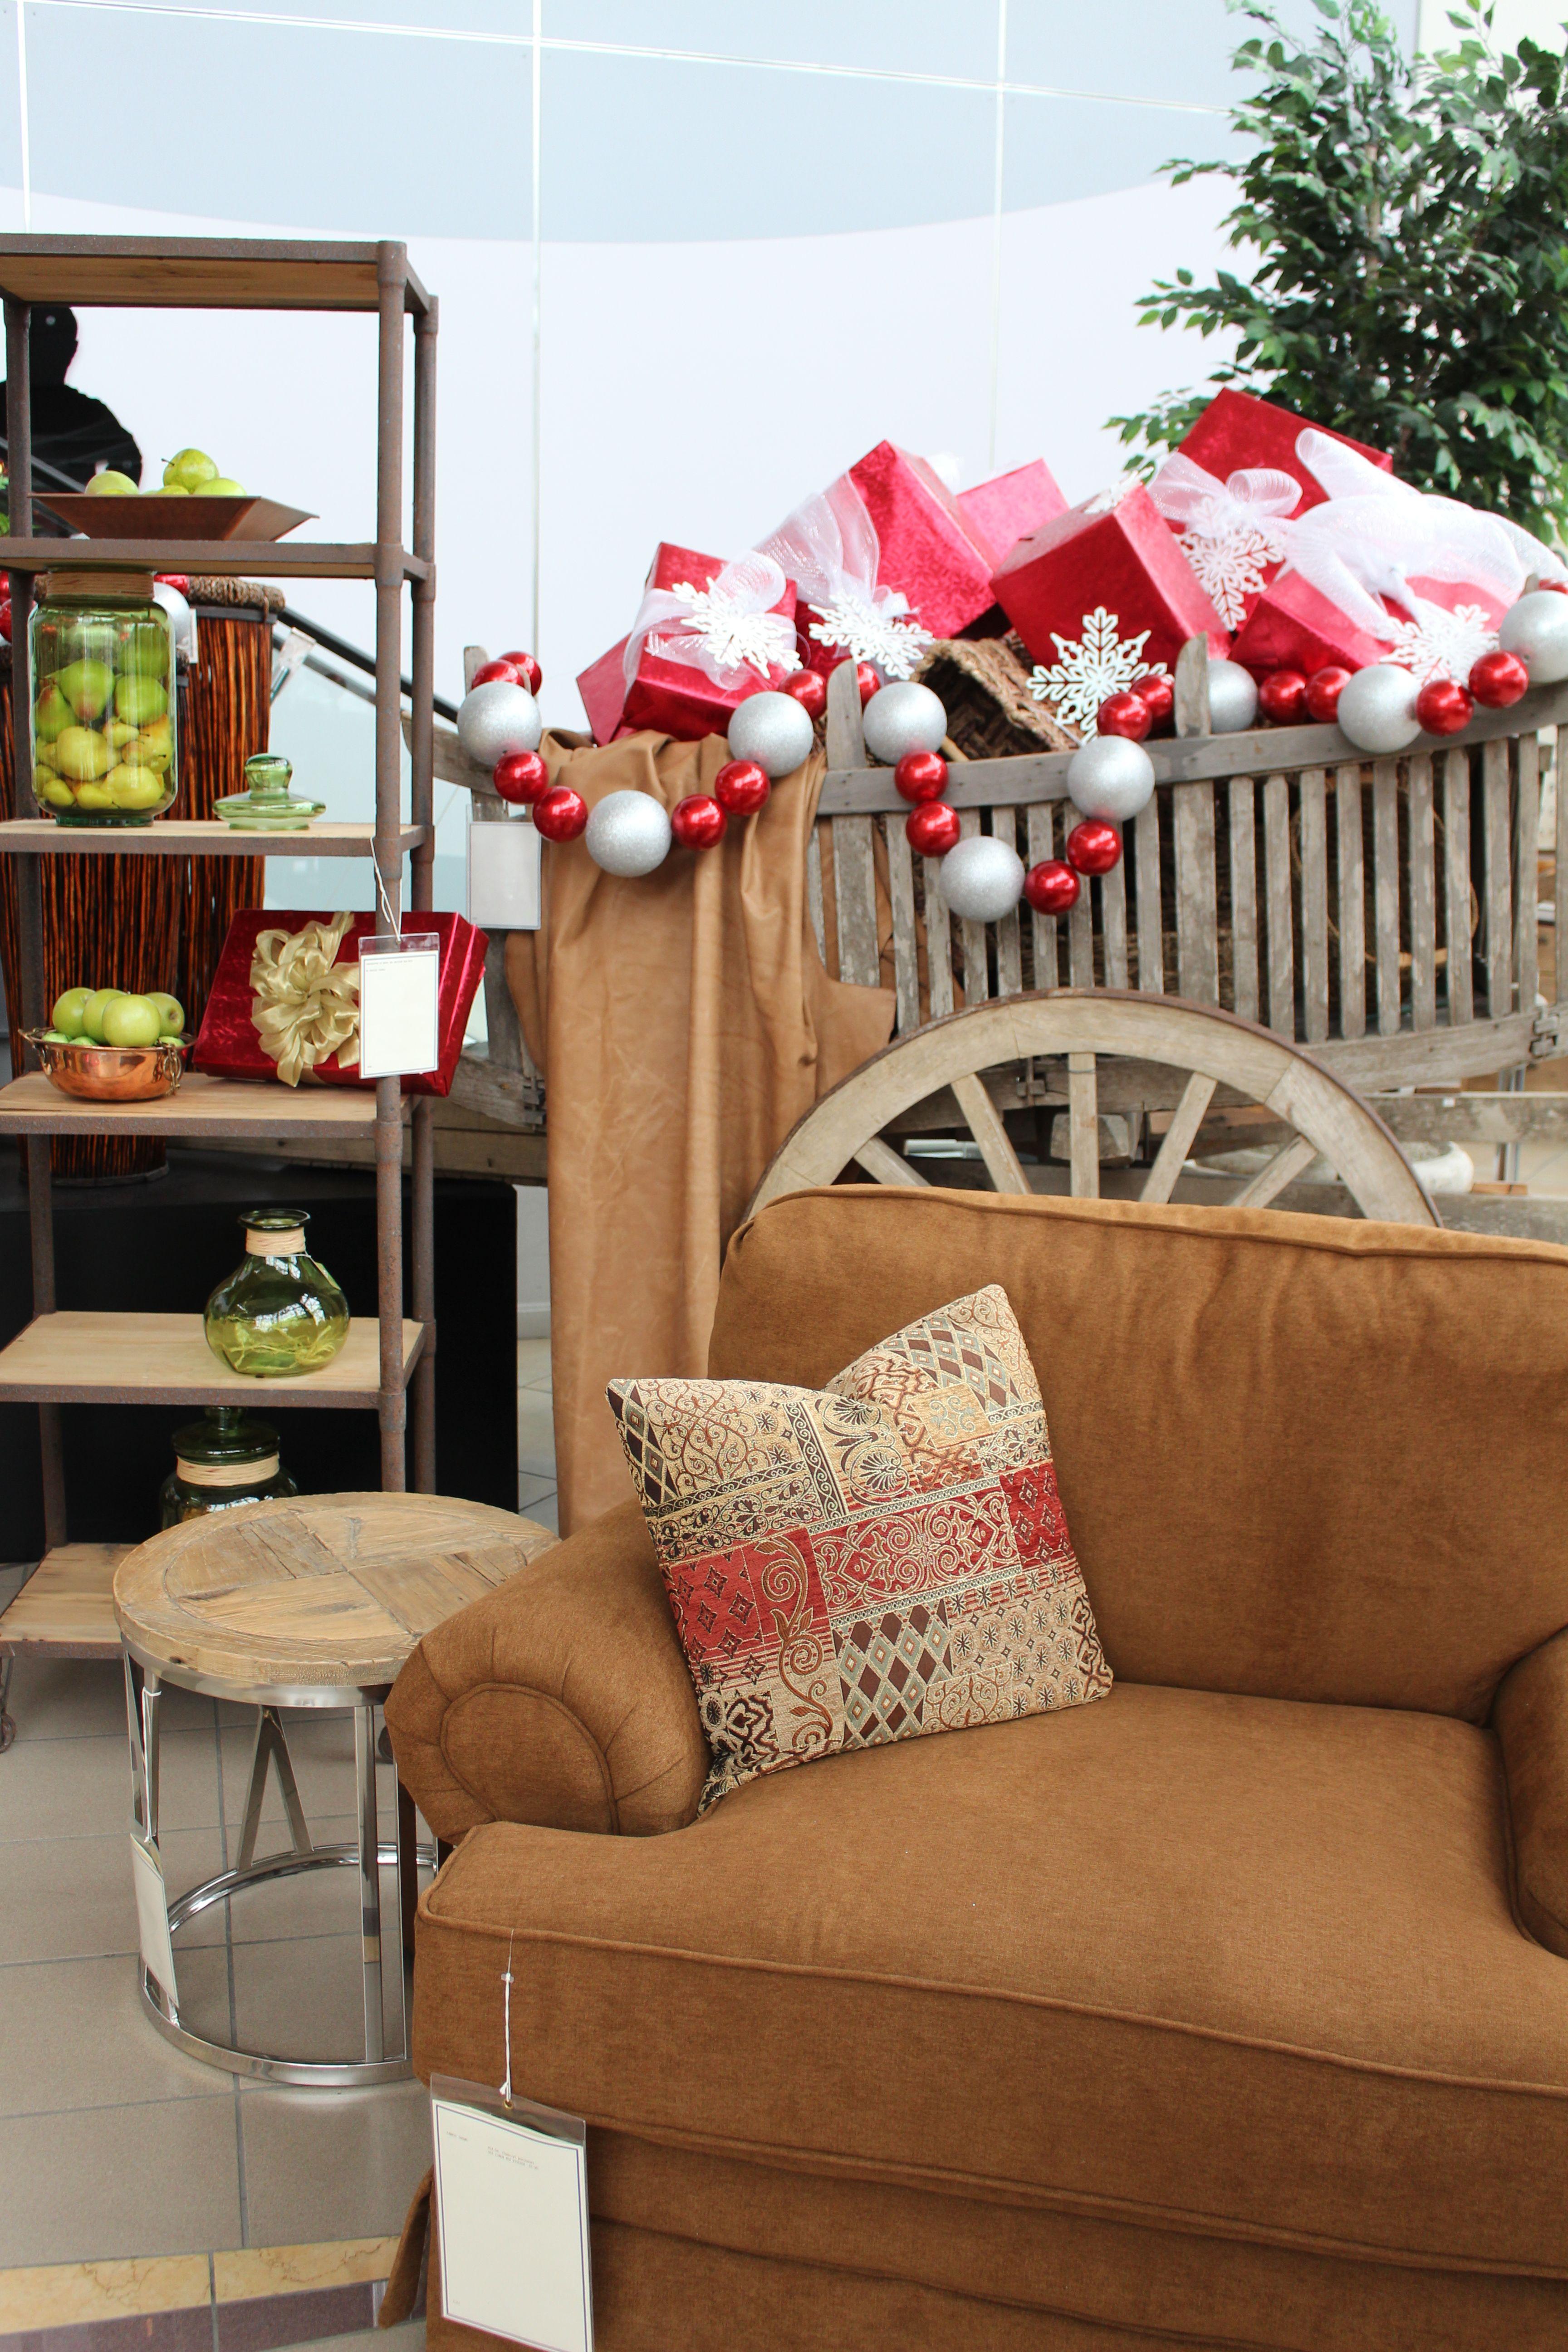 ... Www Cardisfurniture Com #14   #CardisFurniture #Cardis #Furniture  #Inspiration #Inspire ...